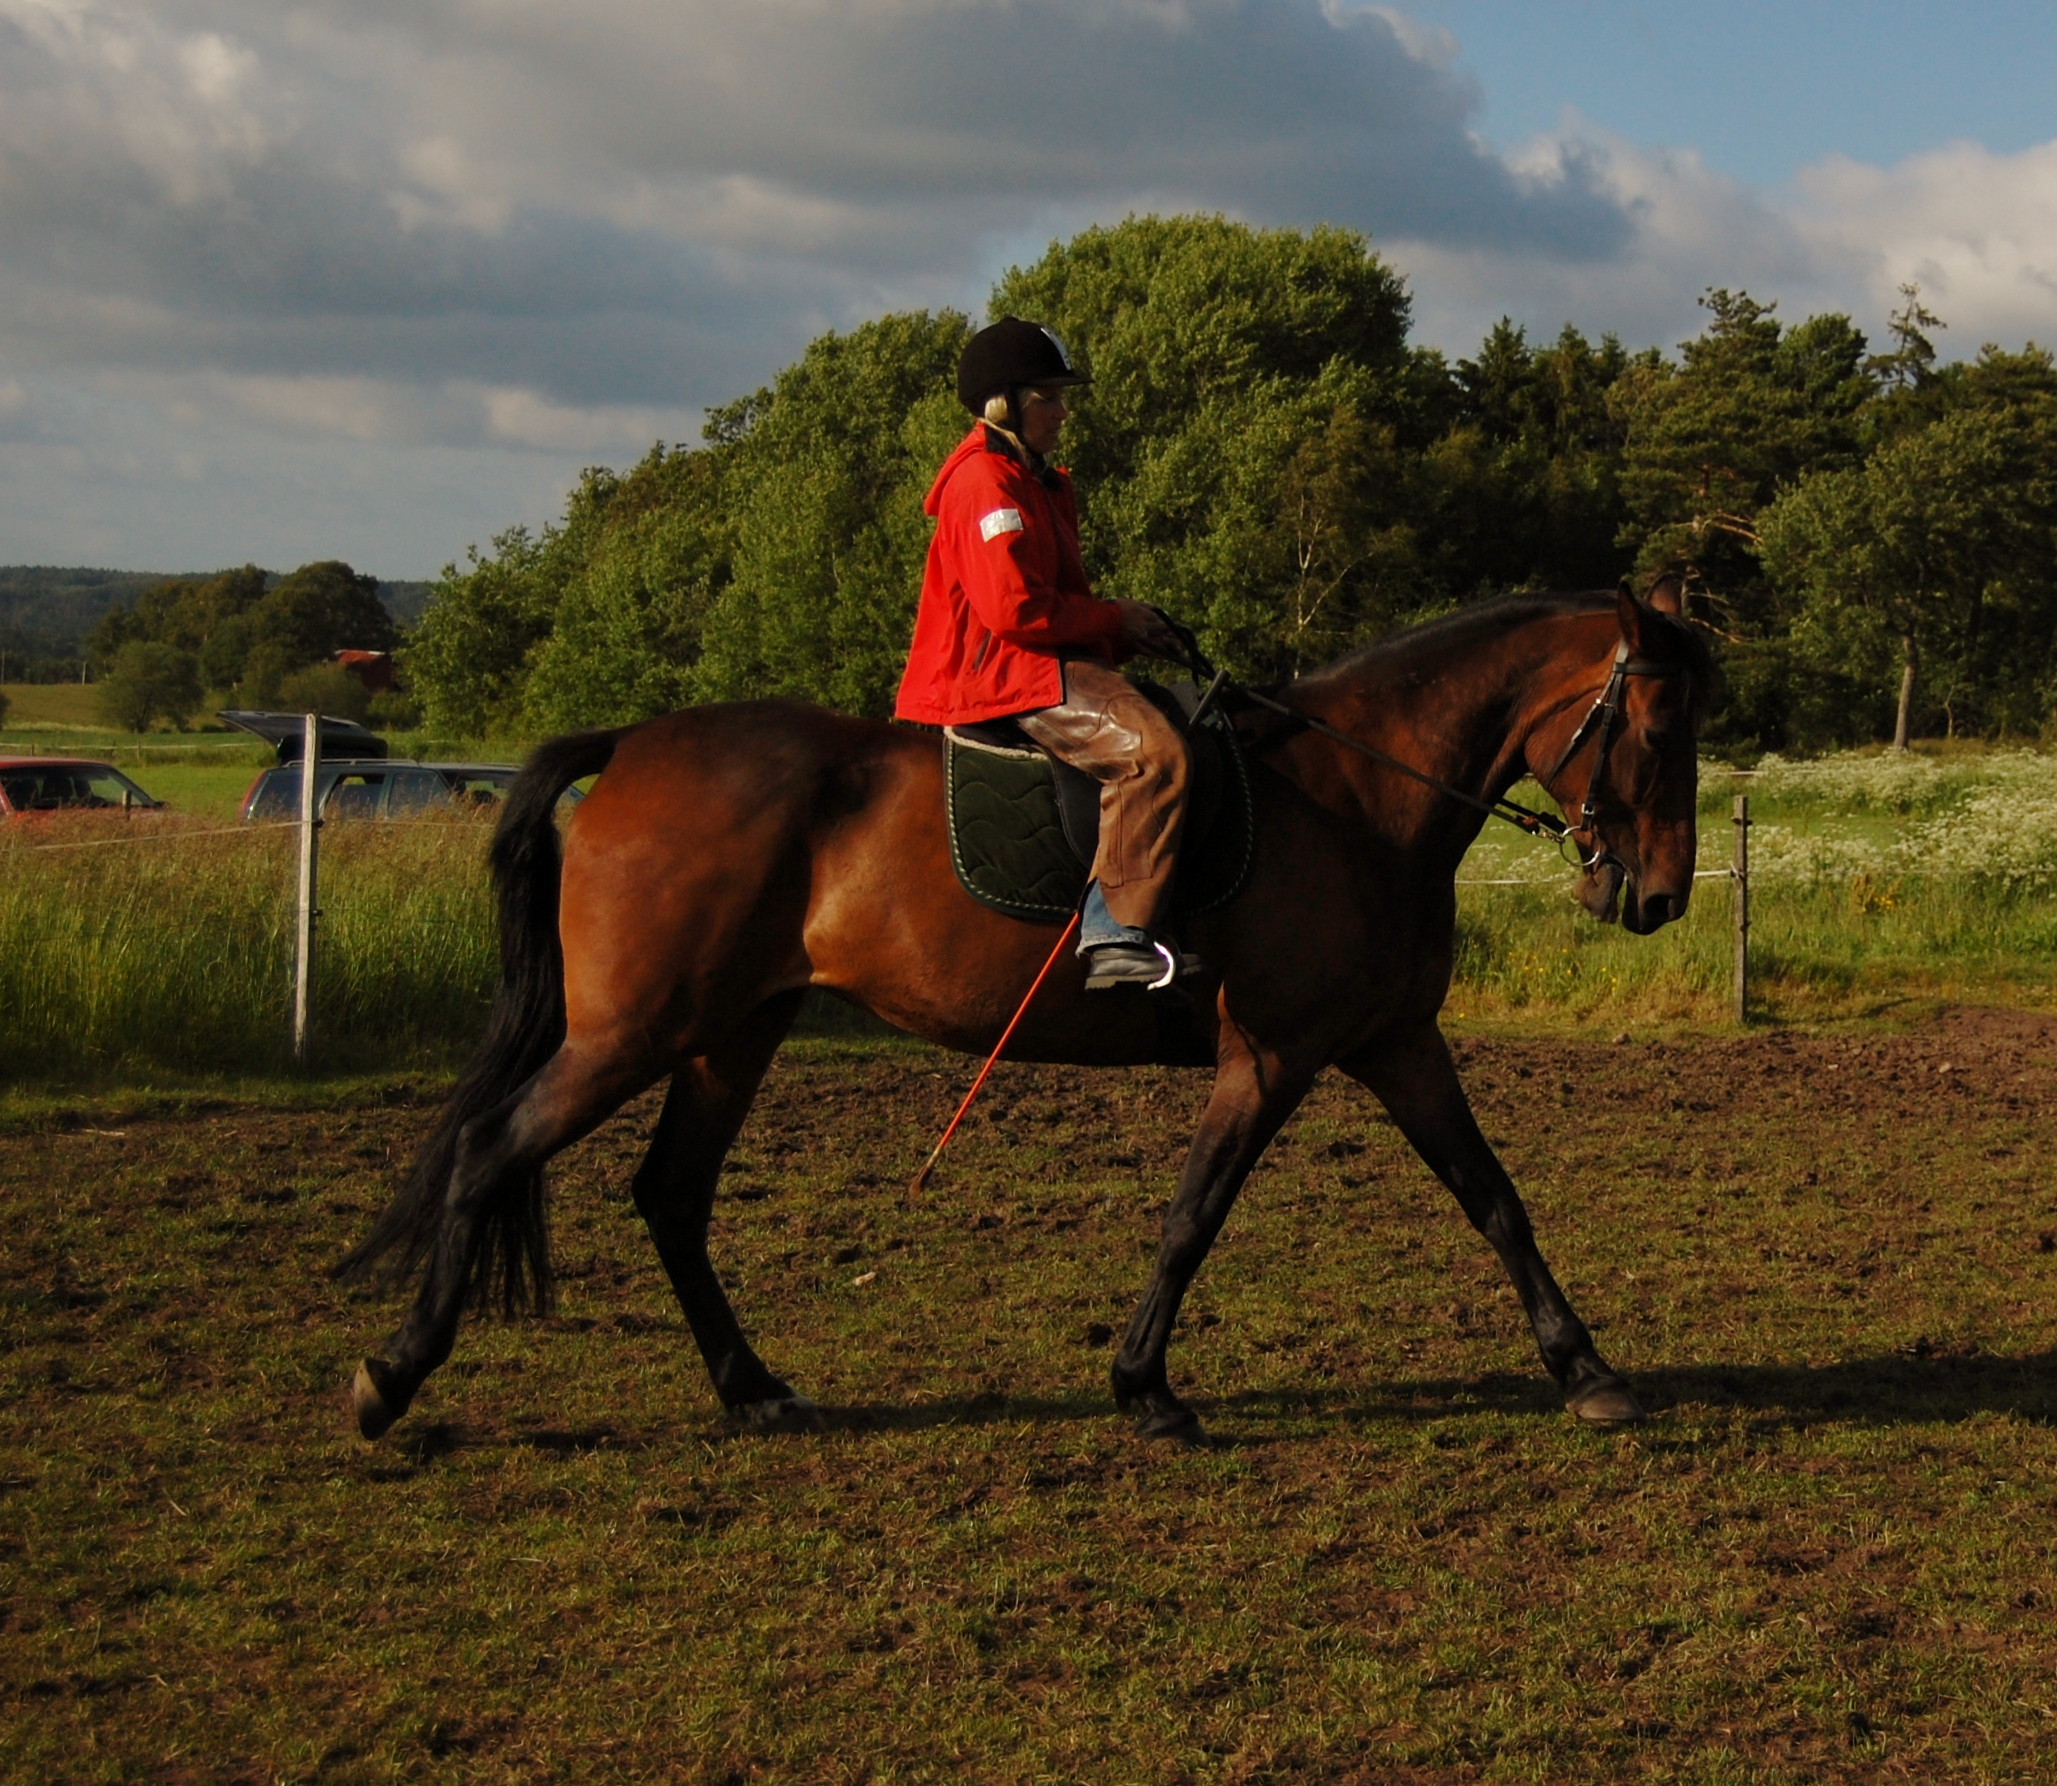 Finess natural horsemanship